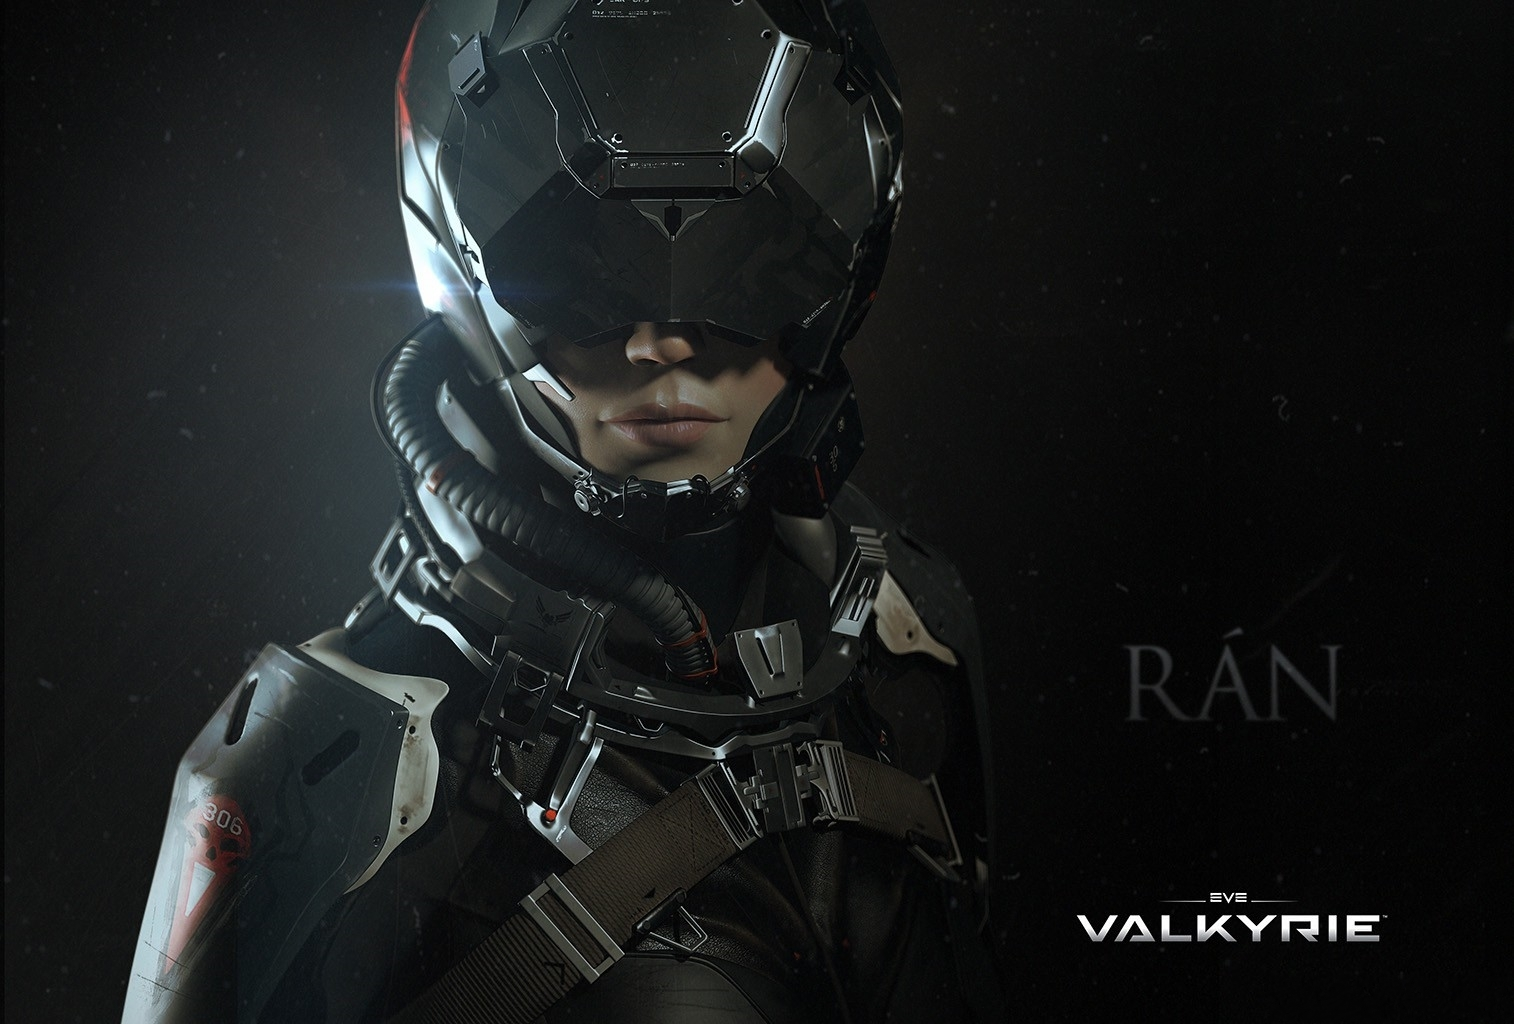 EVE:瓦尔基里11月登陆HTC